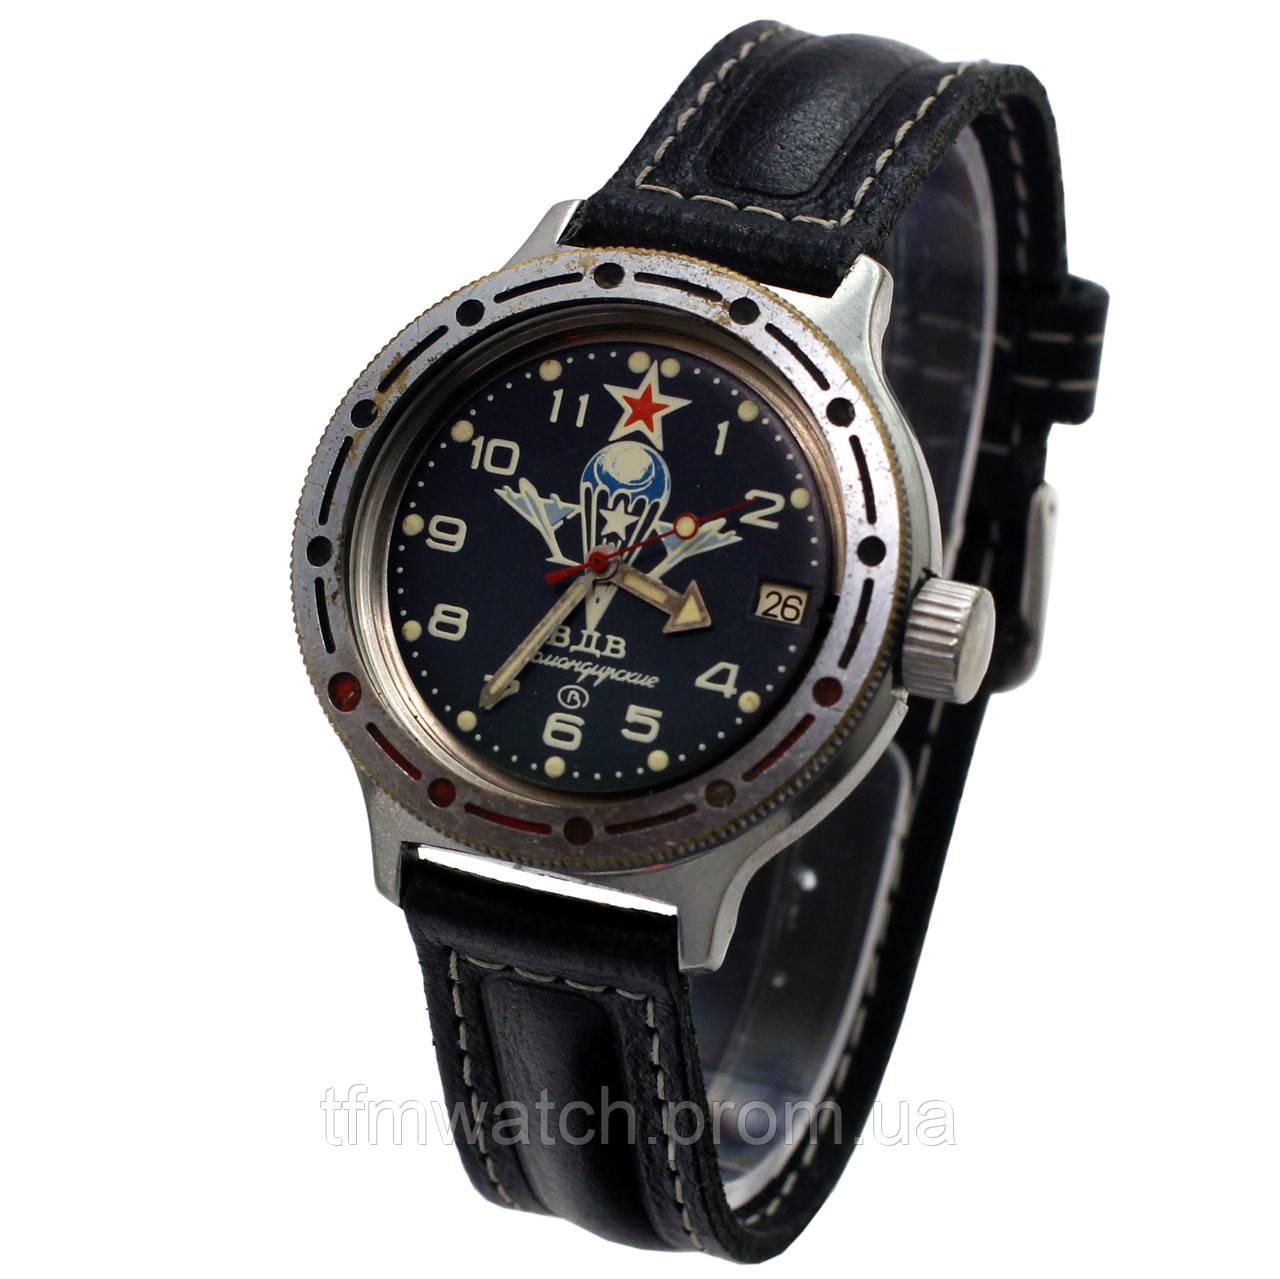 Часы наручные вдв купить почему не дарят наручные часы